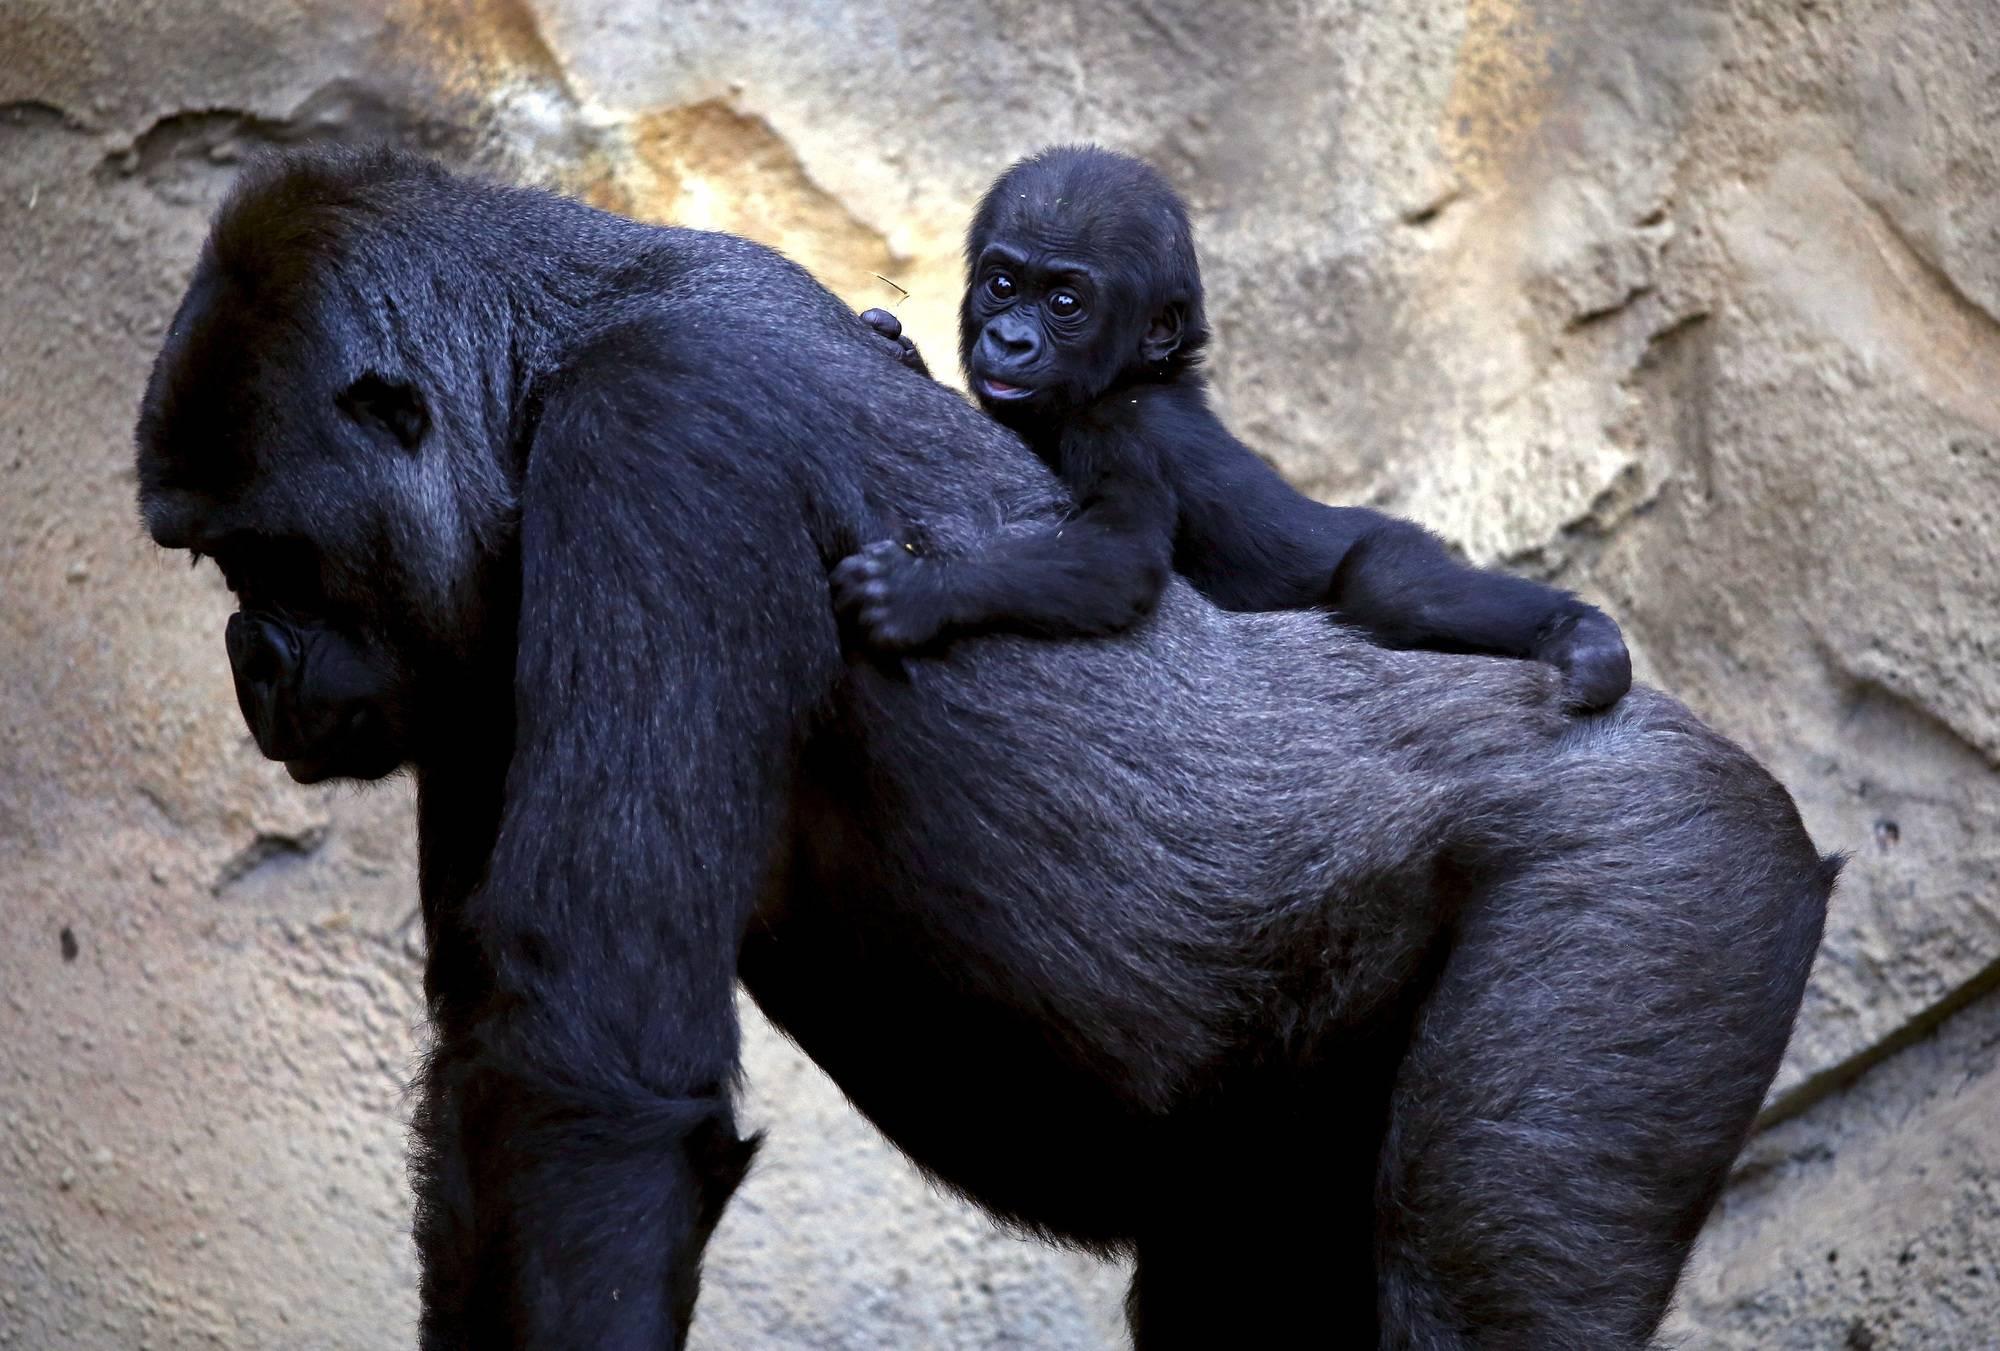 The Year in Photos: Animals & Wildlife